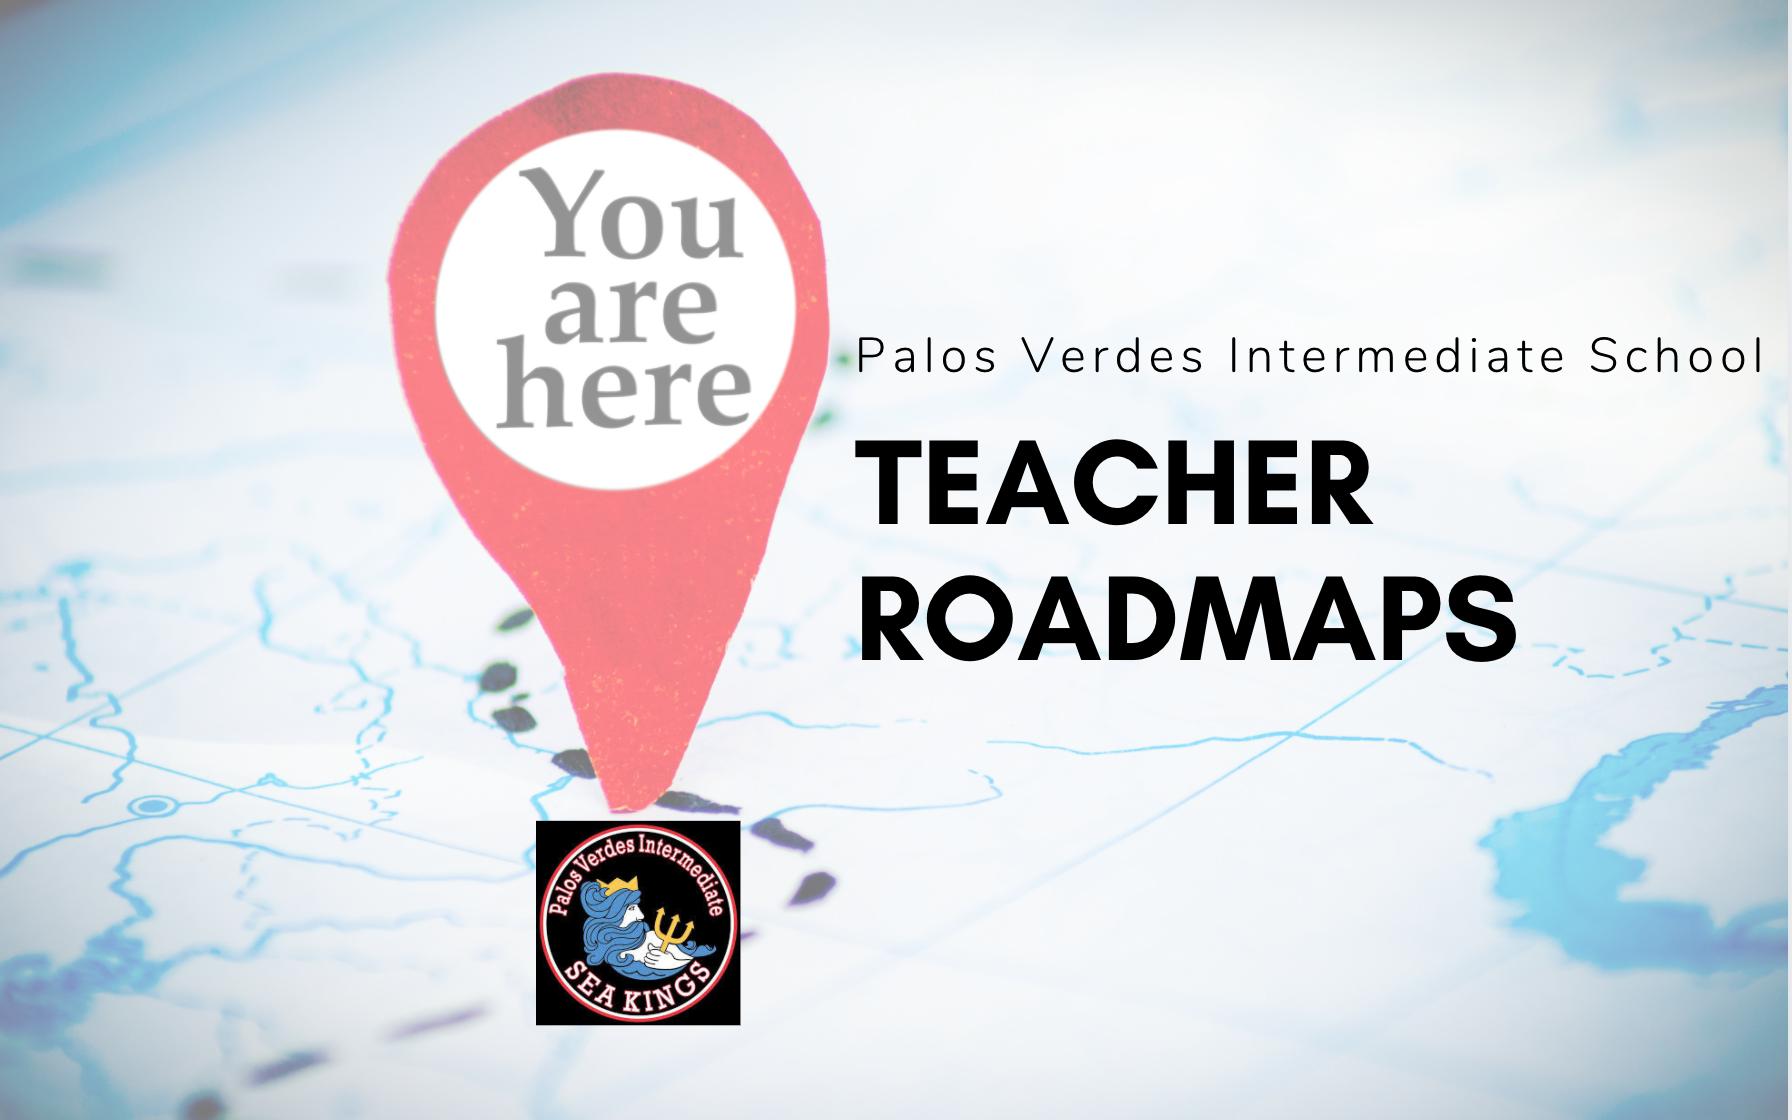 Teacher roadmaps